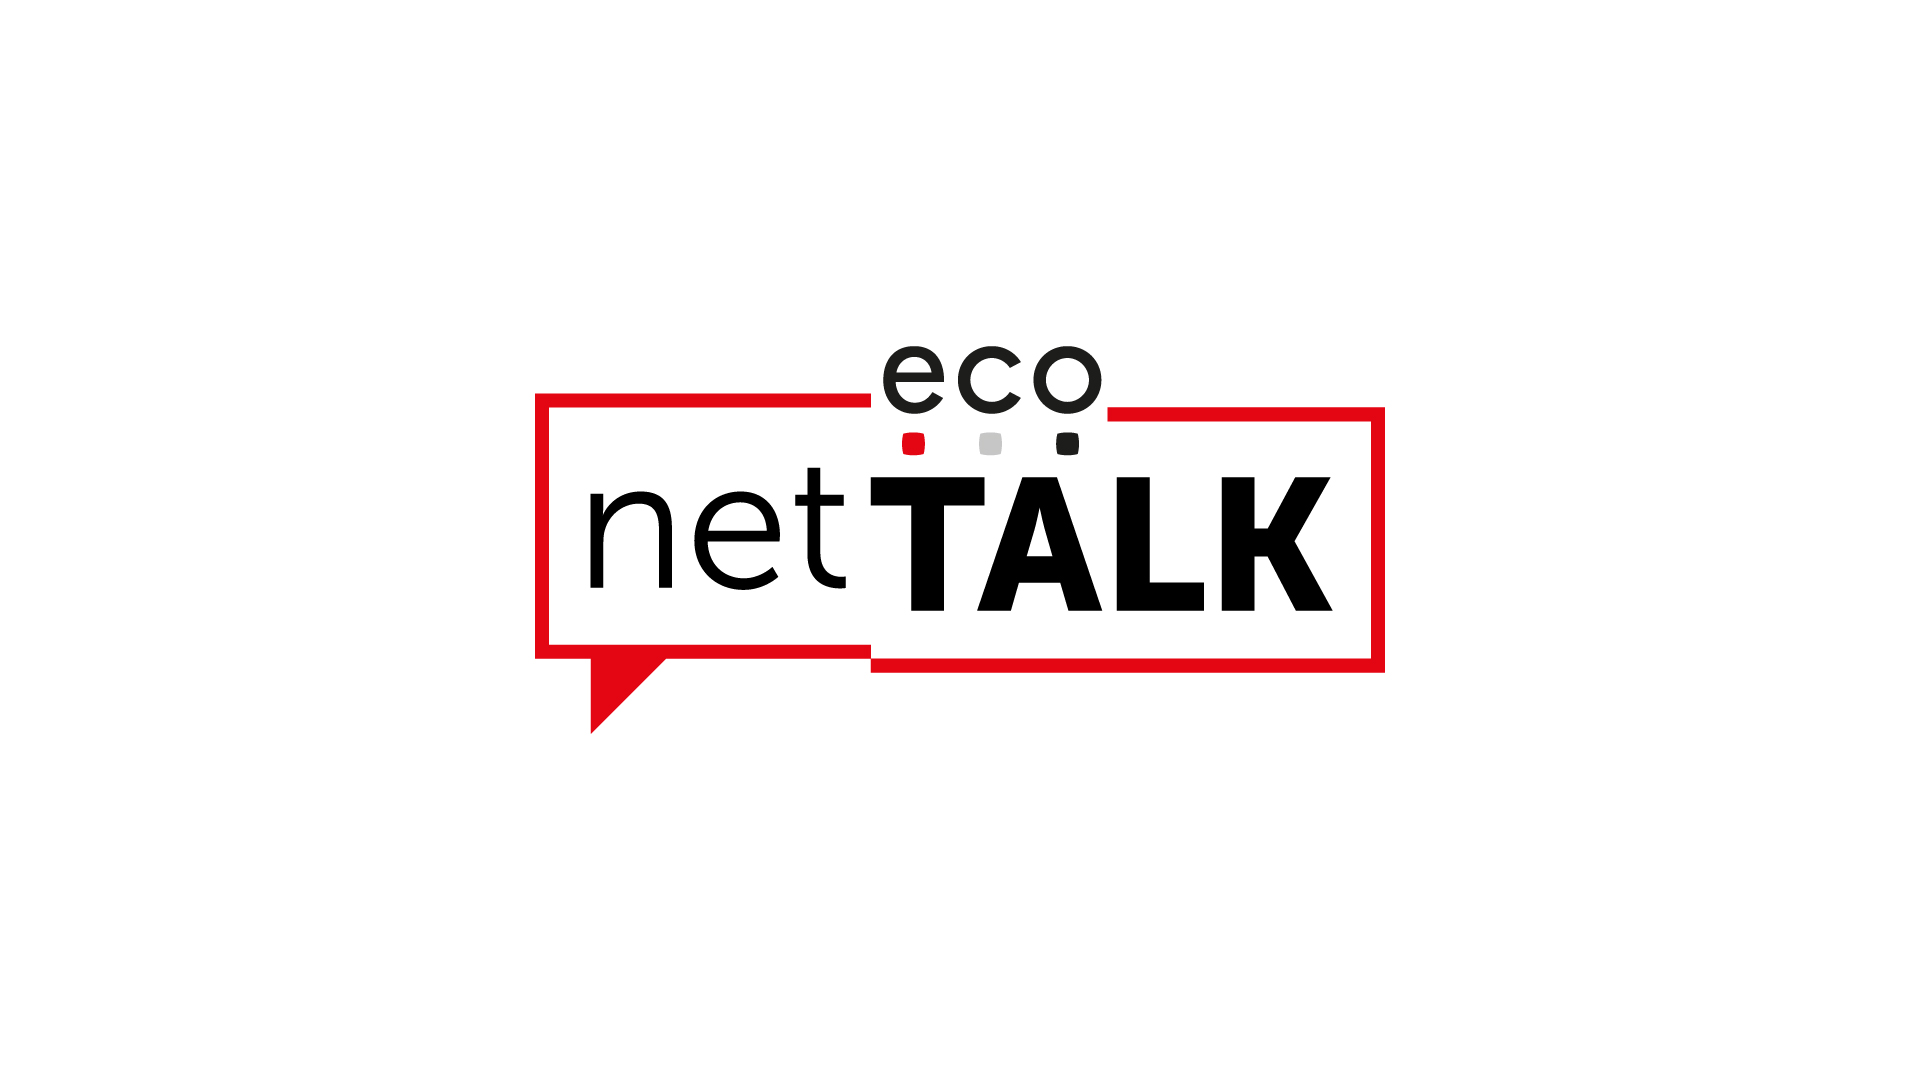 eco netTALK #1 5